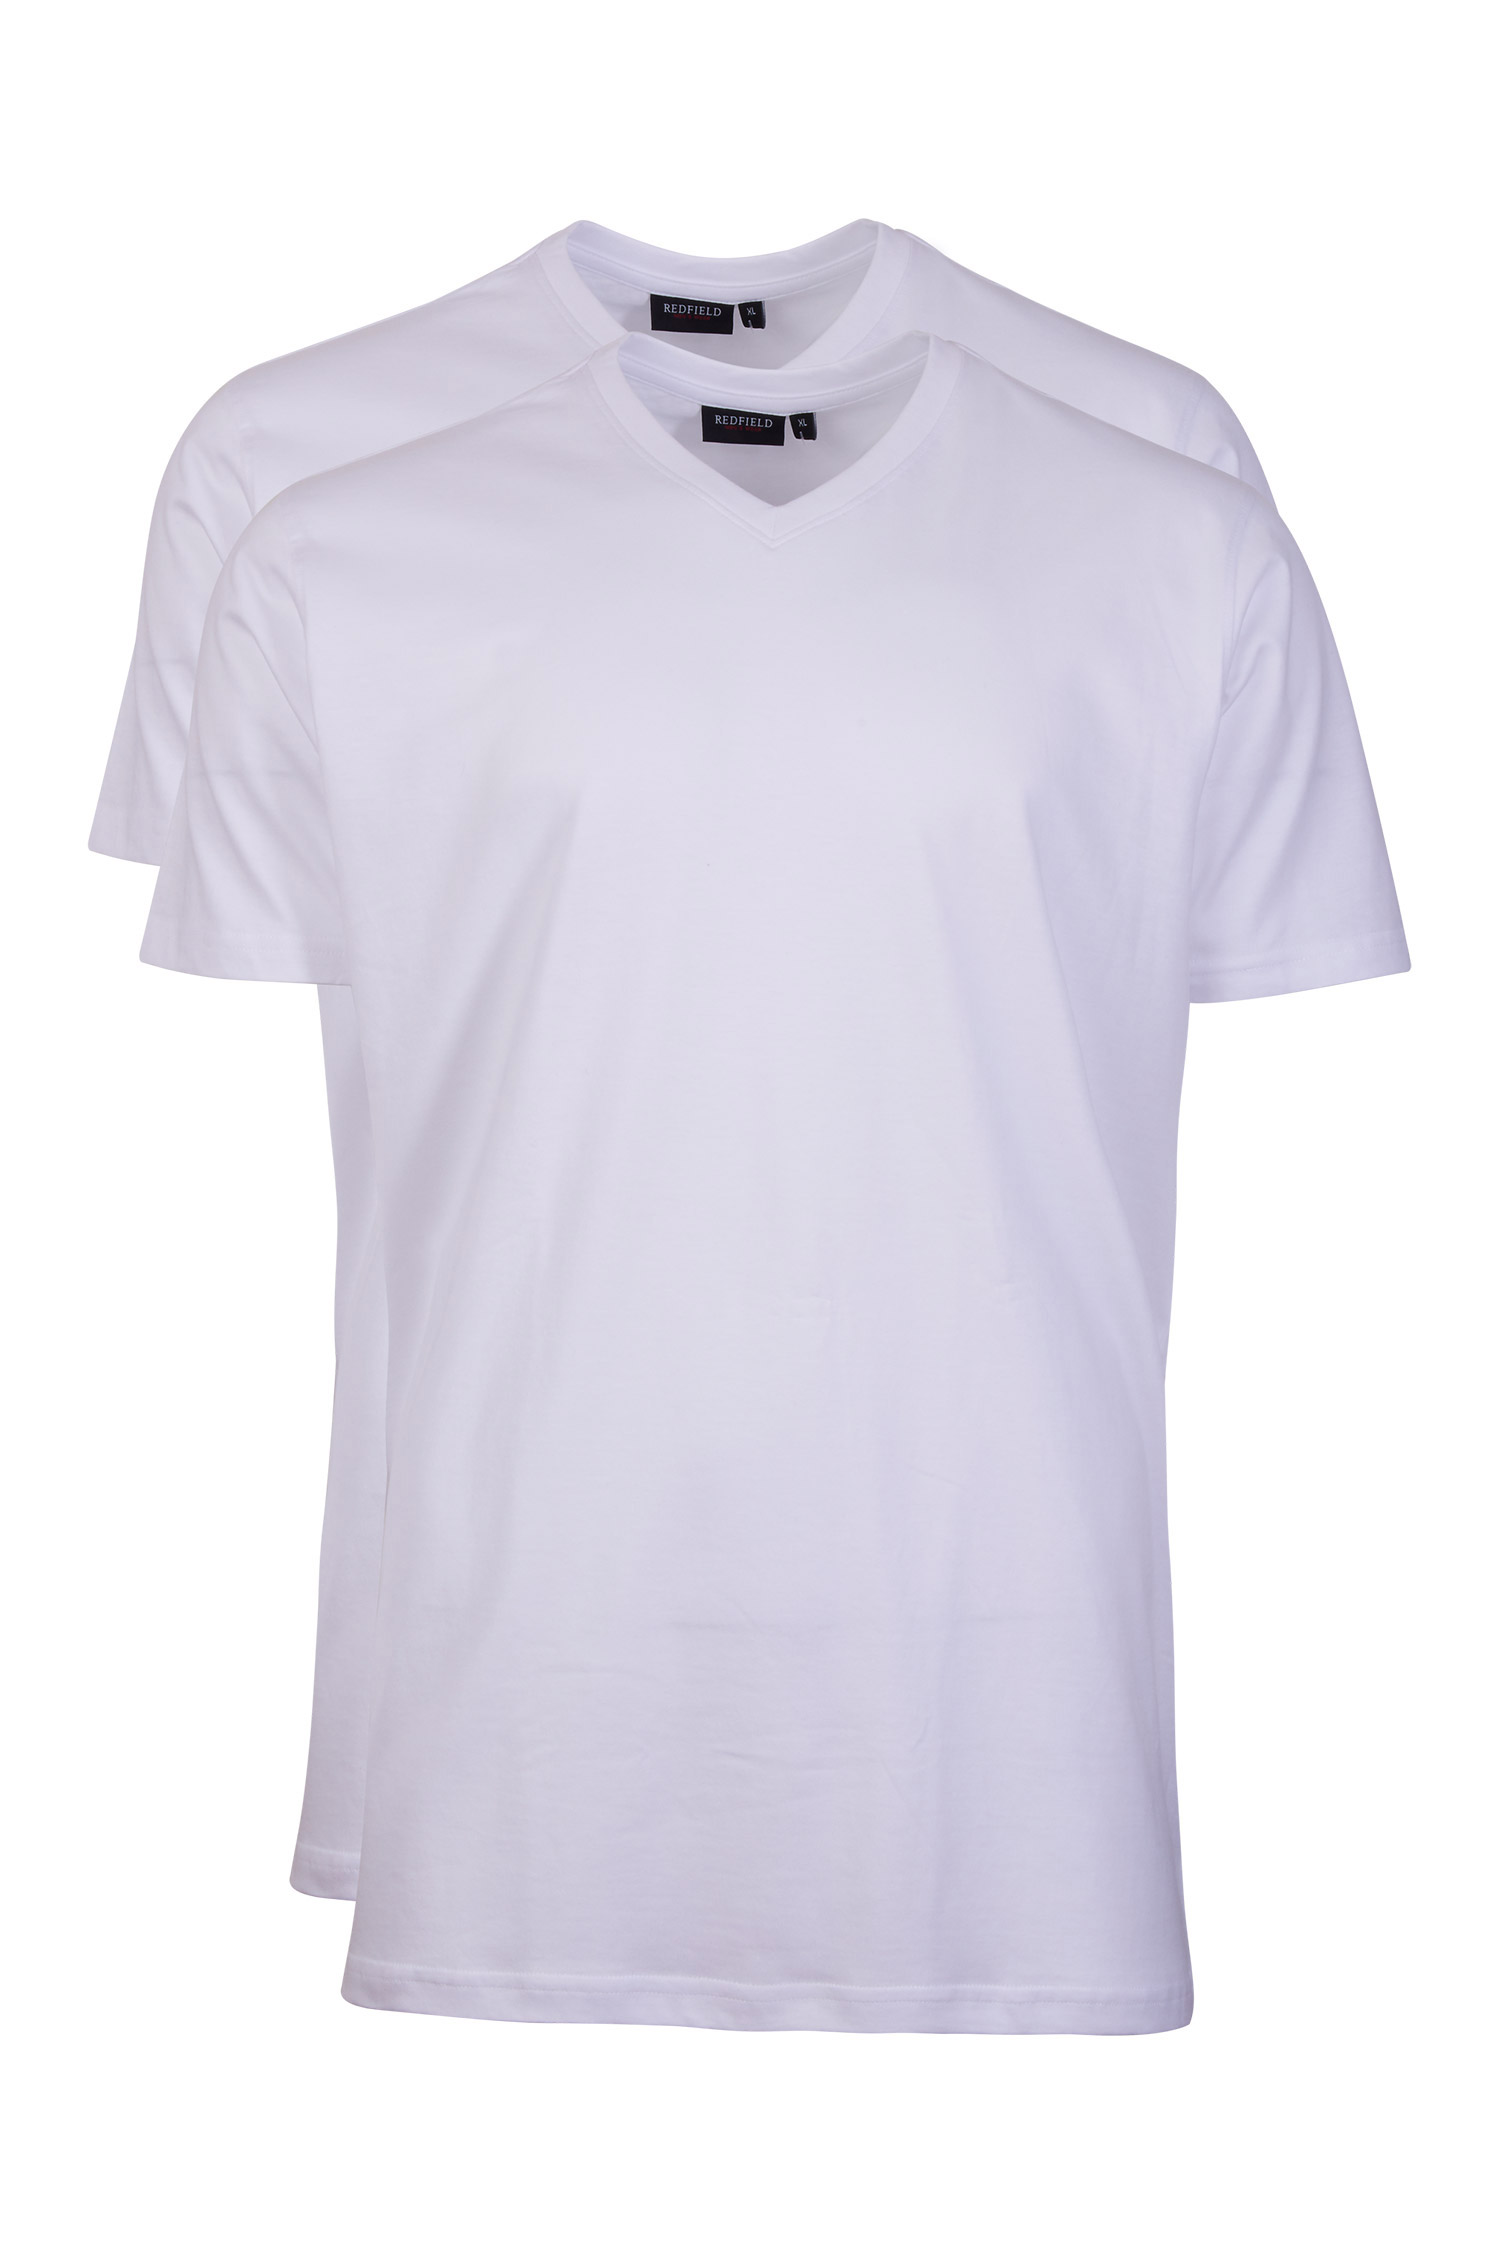 Sport, Camisetas M. Corta, 107495, BLANCO | Zoom